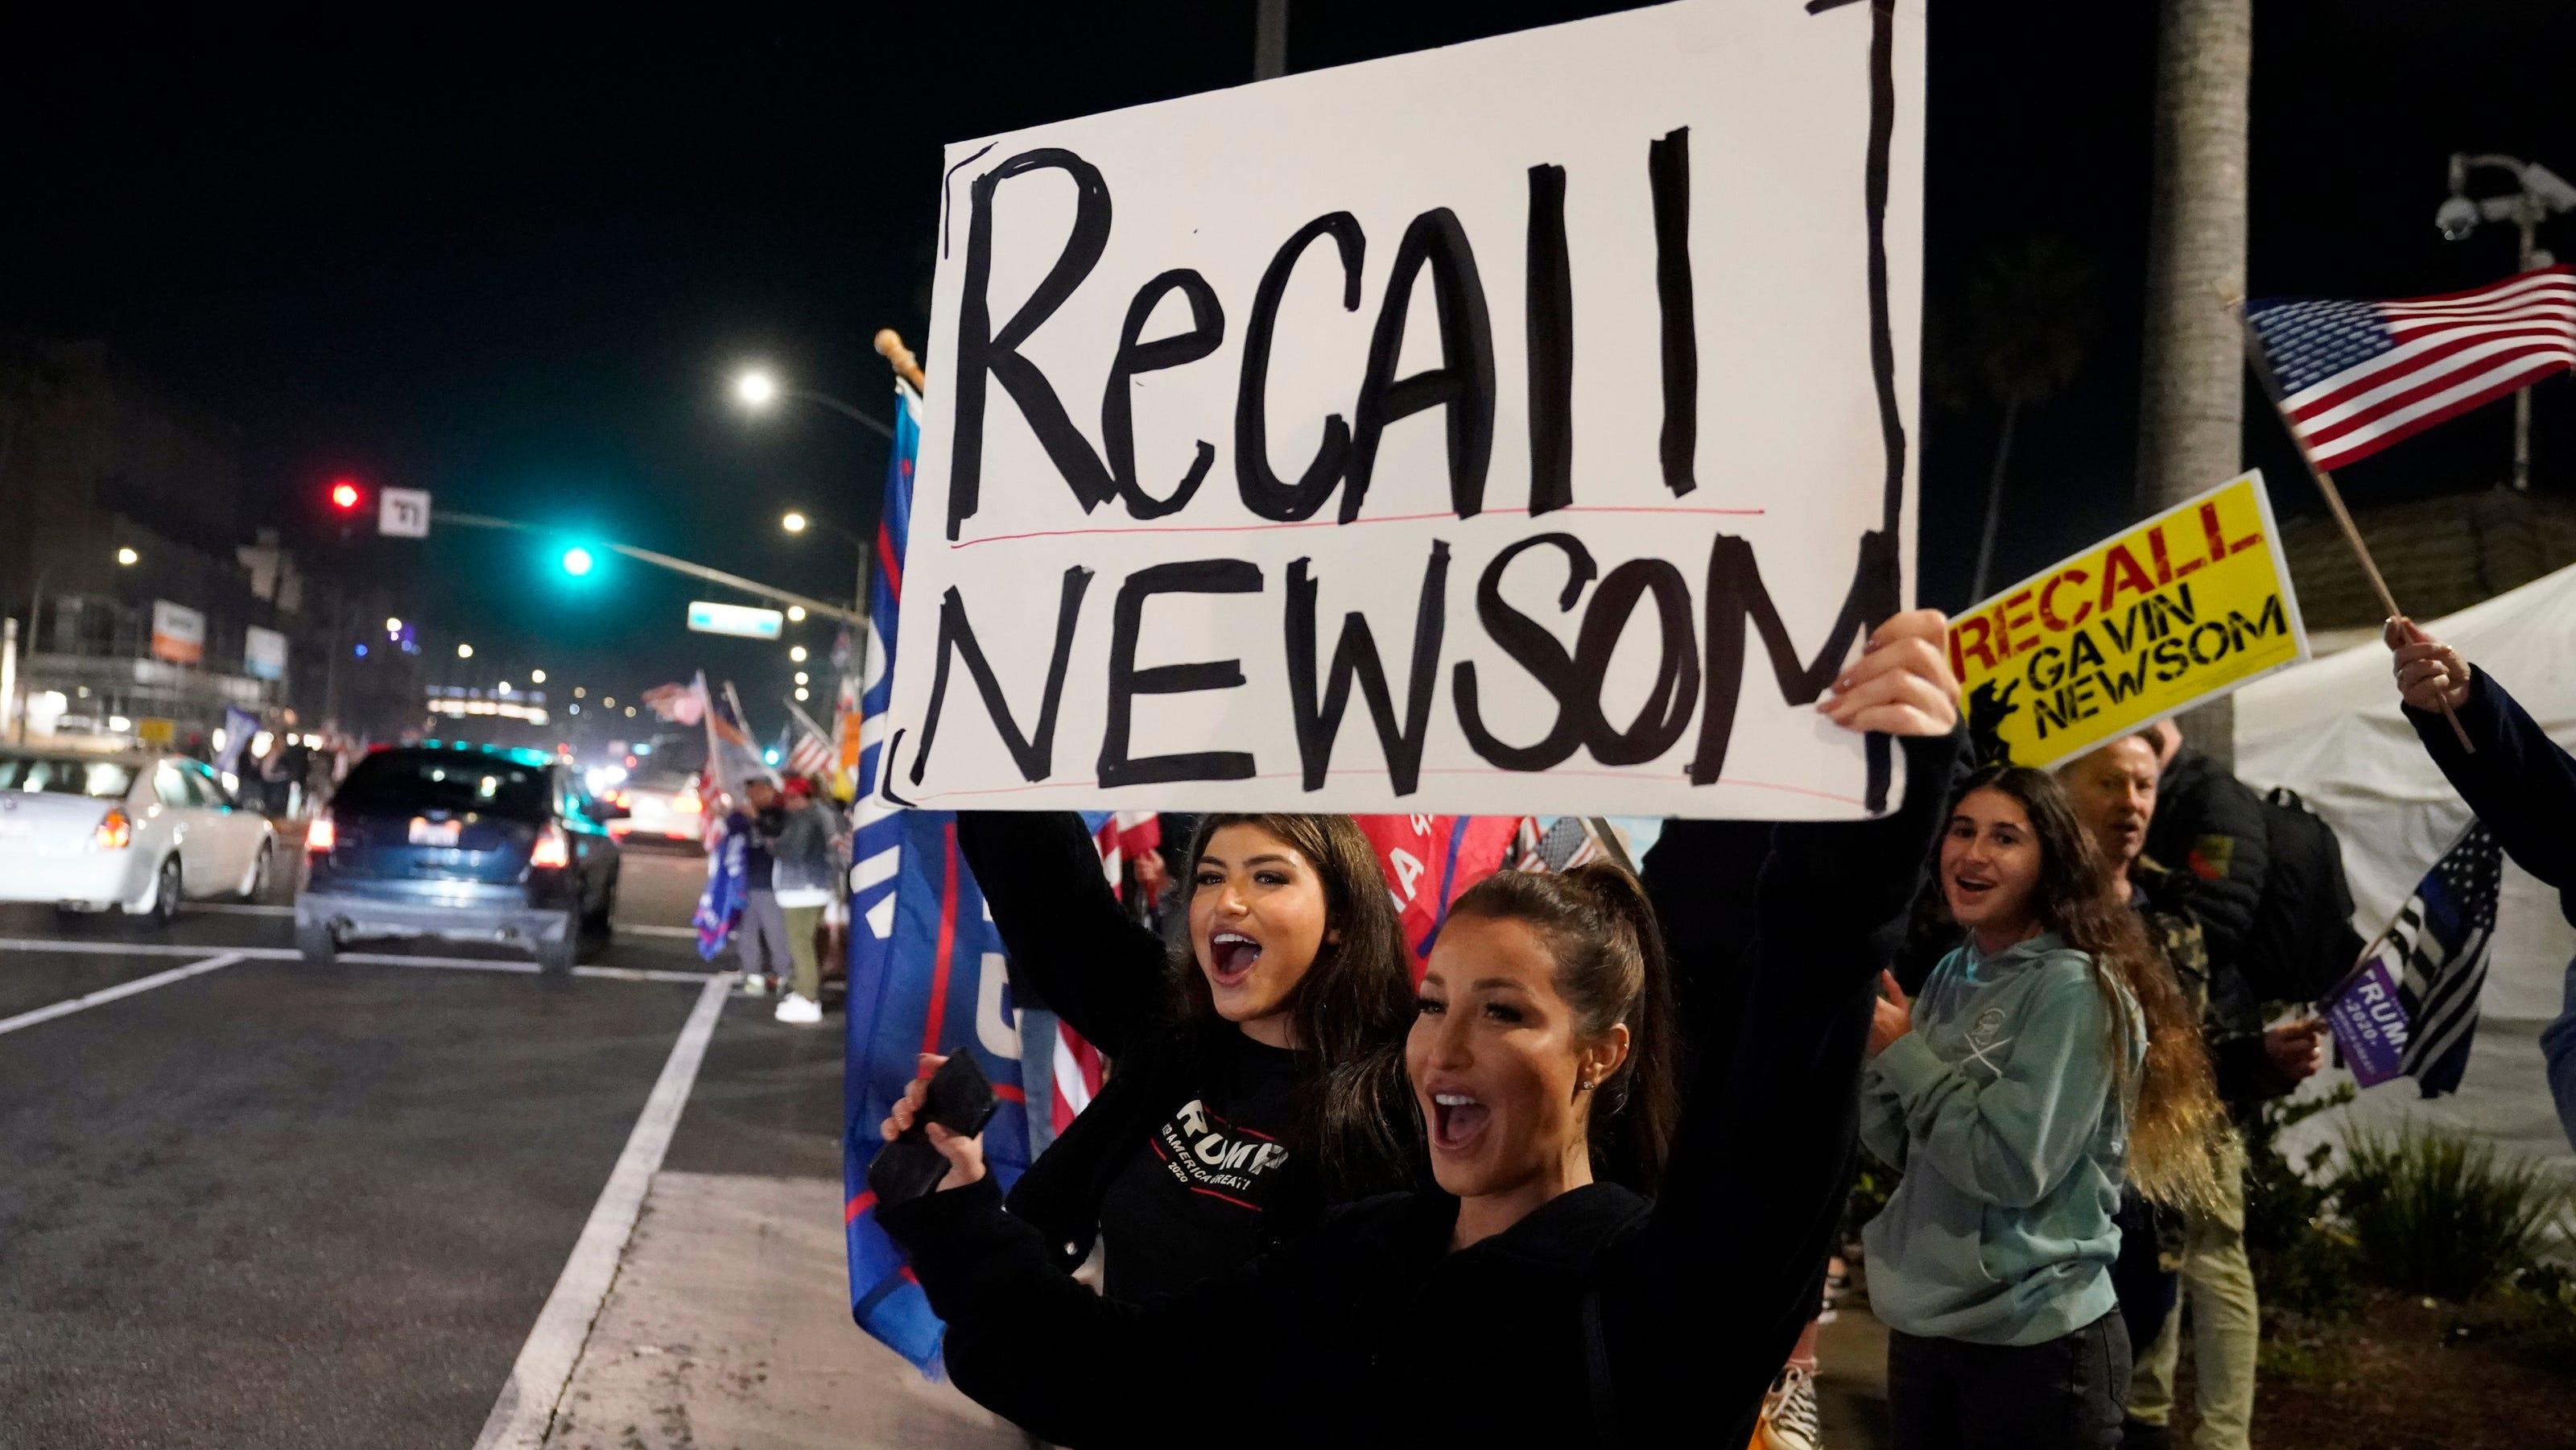 www.desertsun.com: Elias: Newsom's gaffes may hurt him in recall election